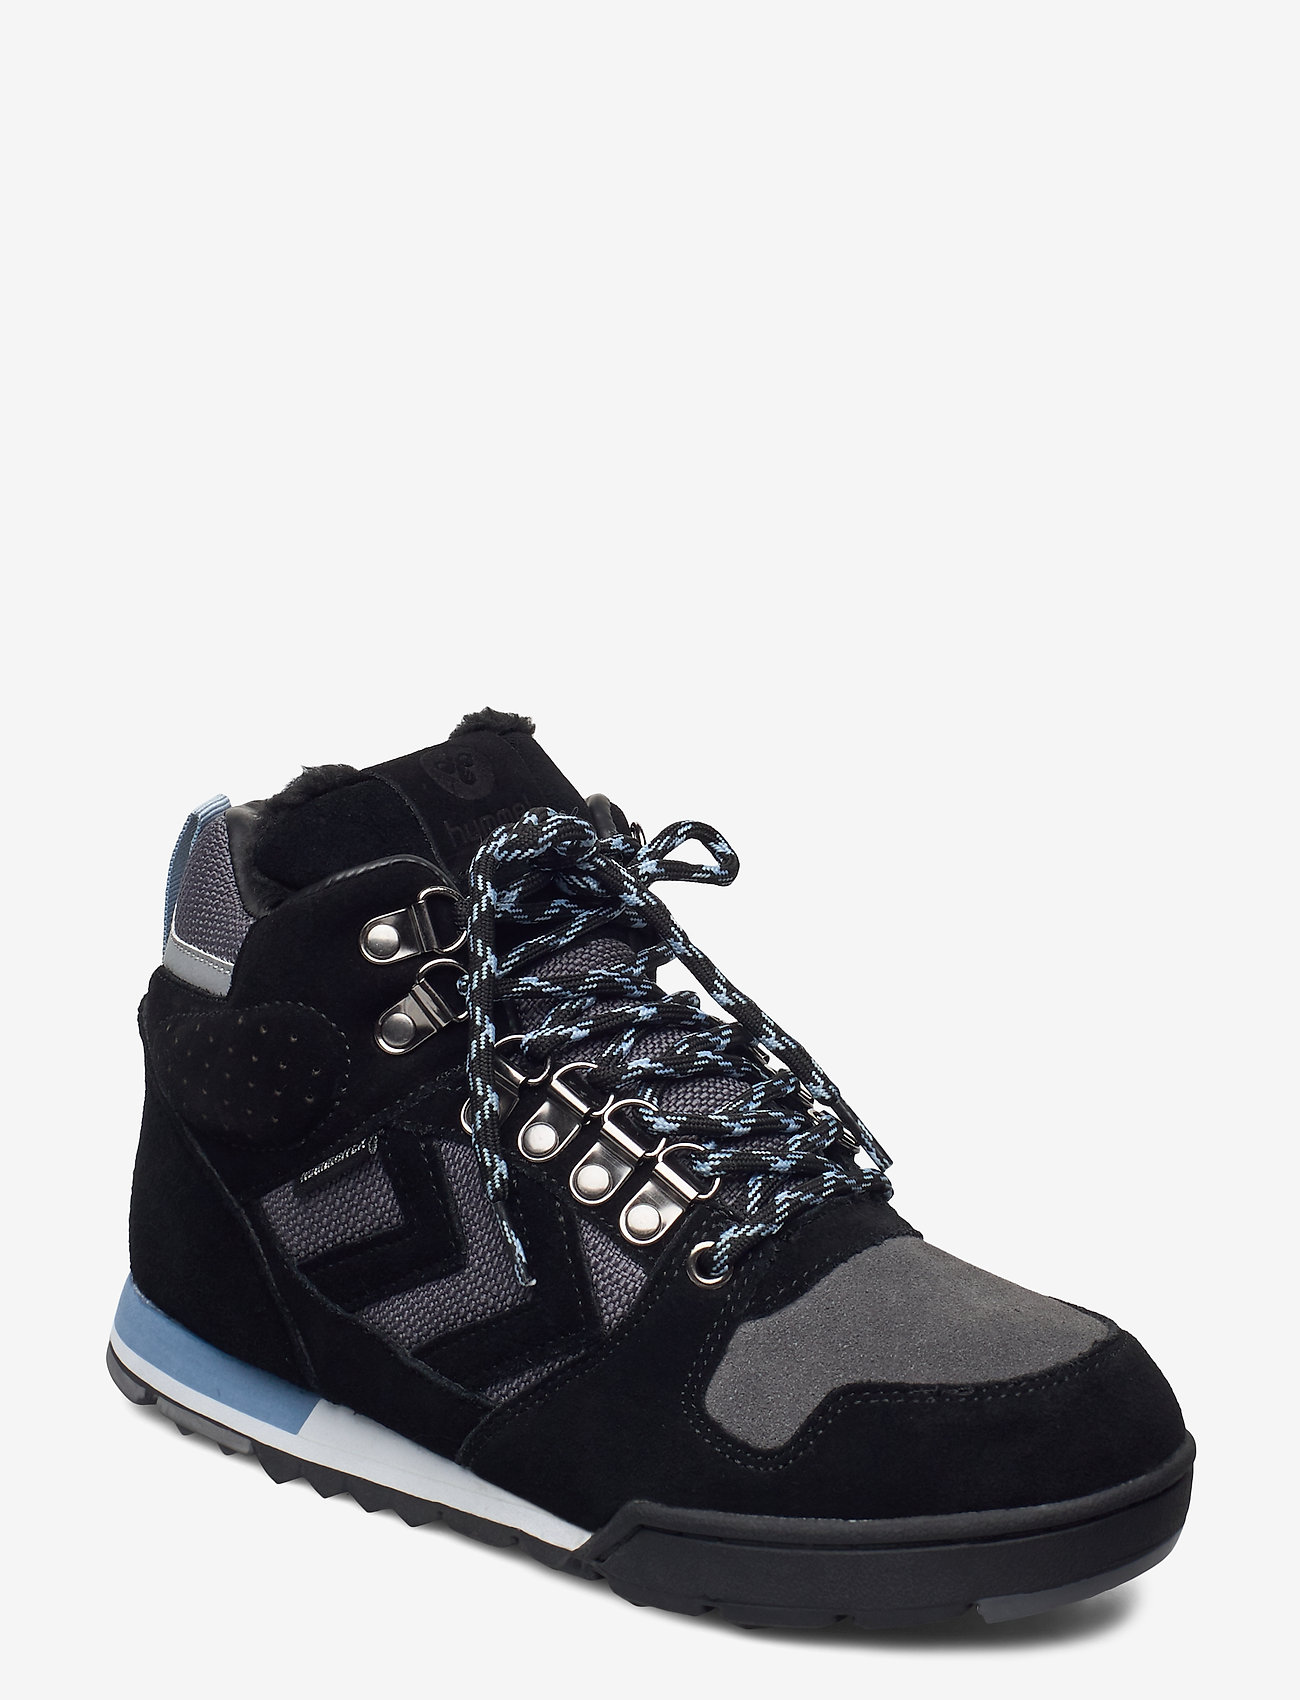 Hummel - NORDIC ROOTS FOREST MID - hoog sneakers - black - 1